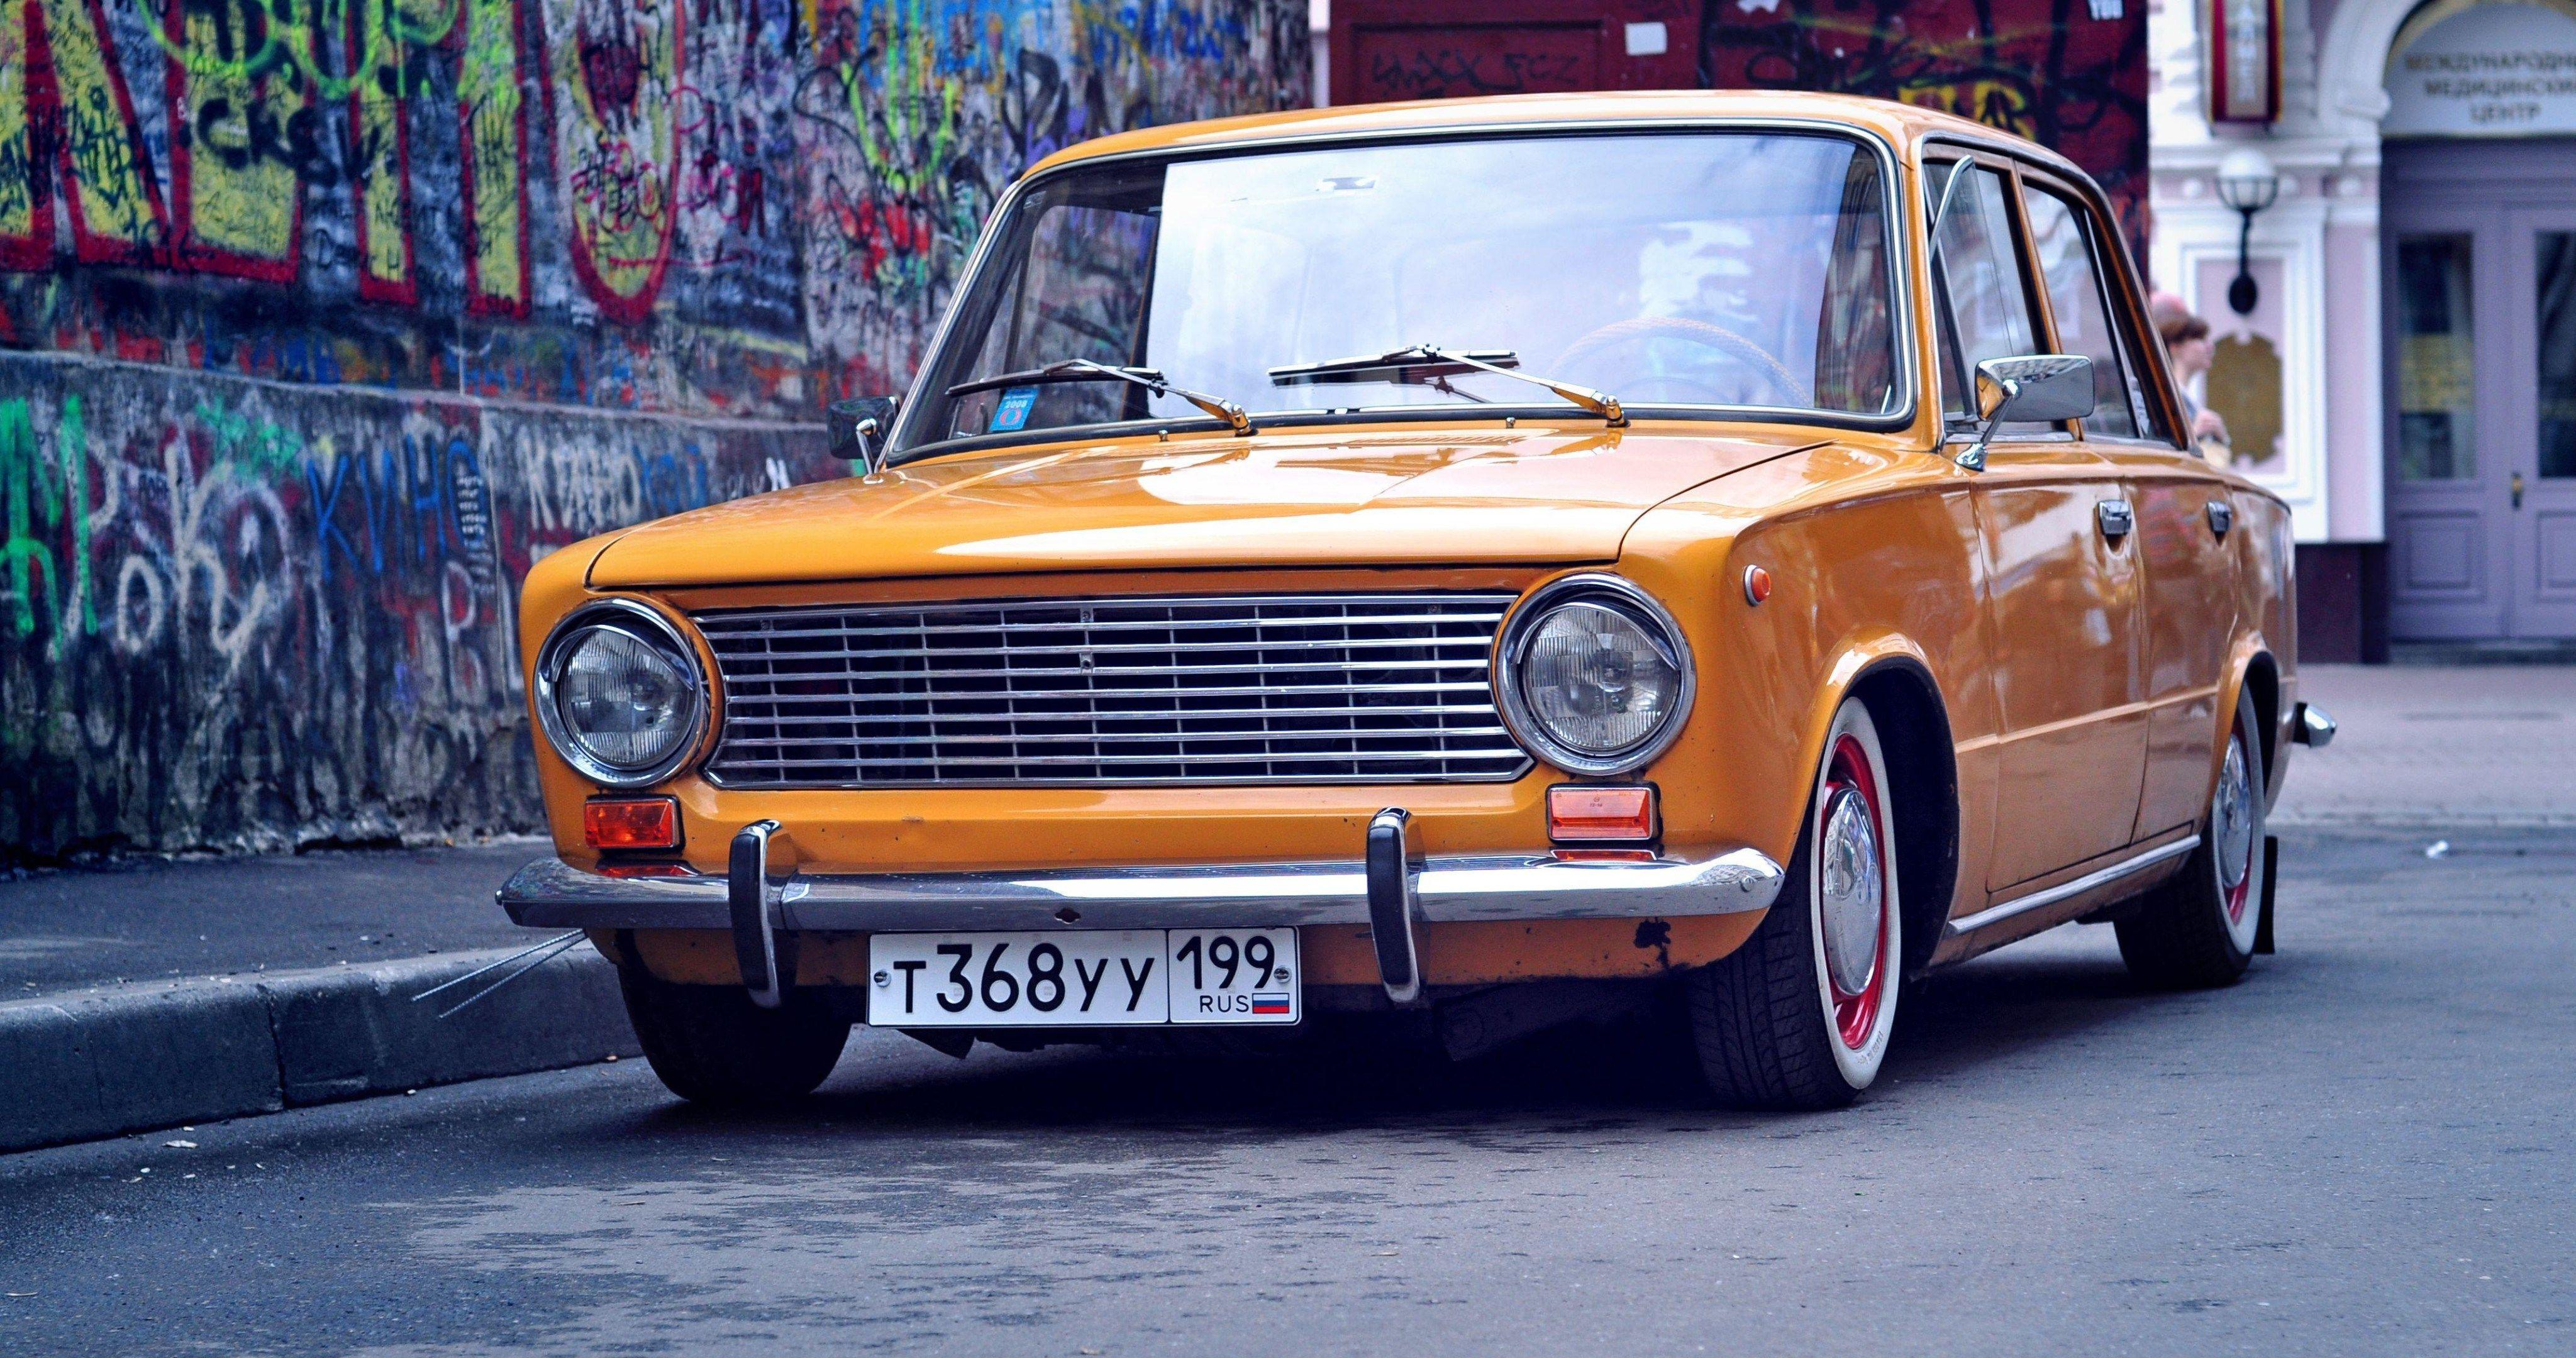 Lada Vaz 2101 Resto Classic 4k Ultra Hd Wallpaper Sedan Fiat Cars Hd Wallpaper